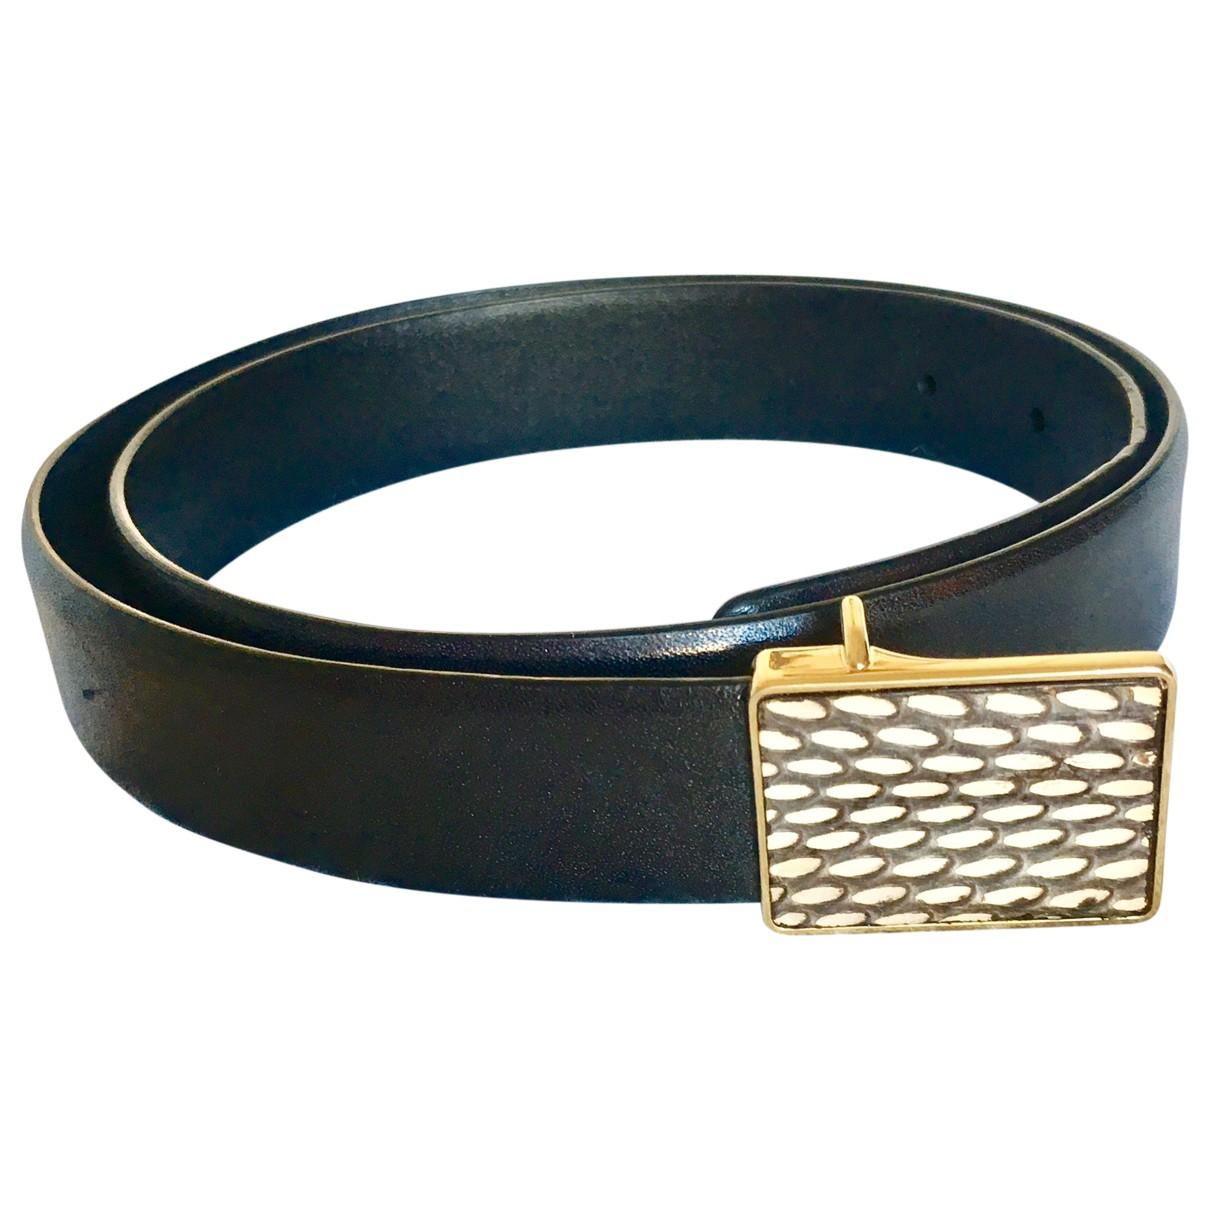 Celine \N Black Leather belt for Women L International